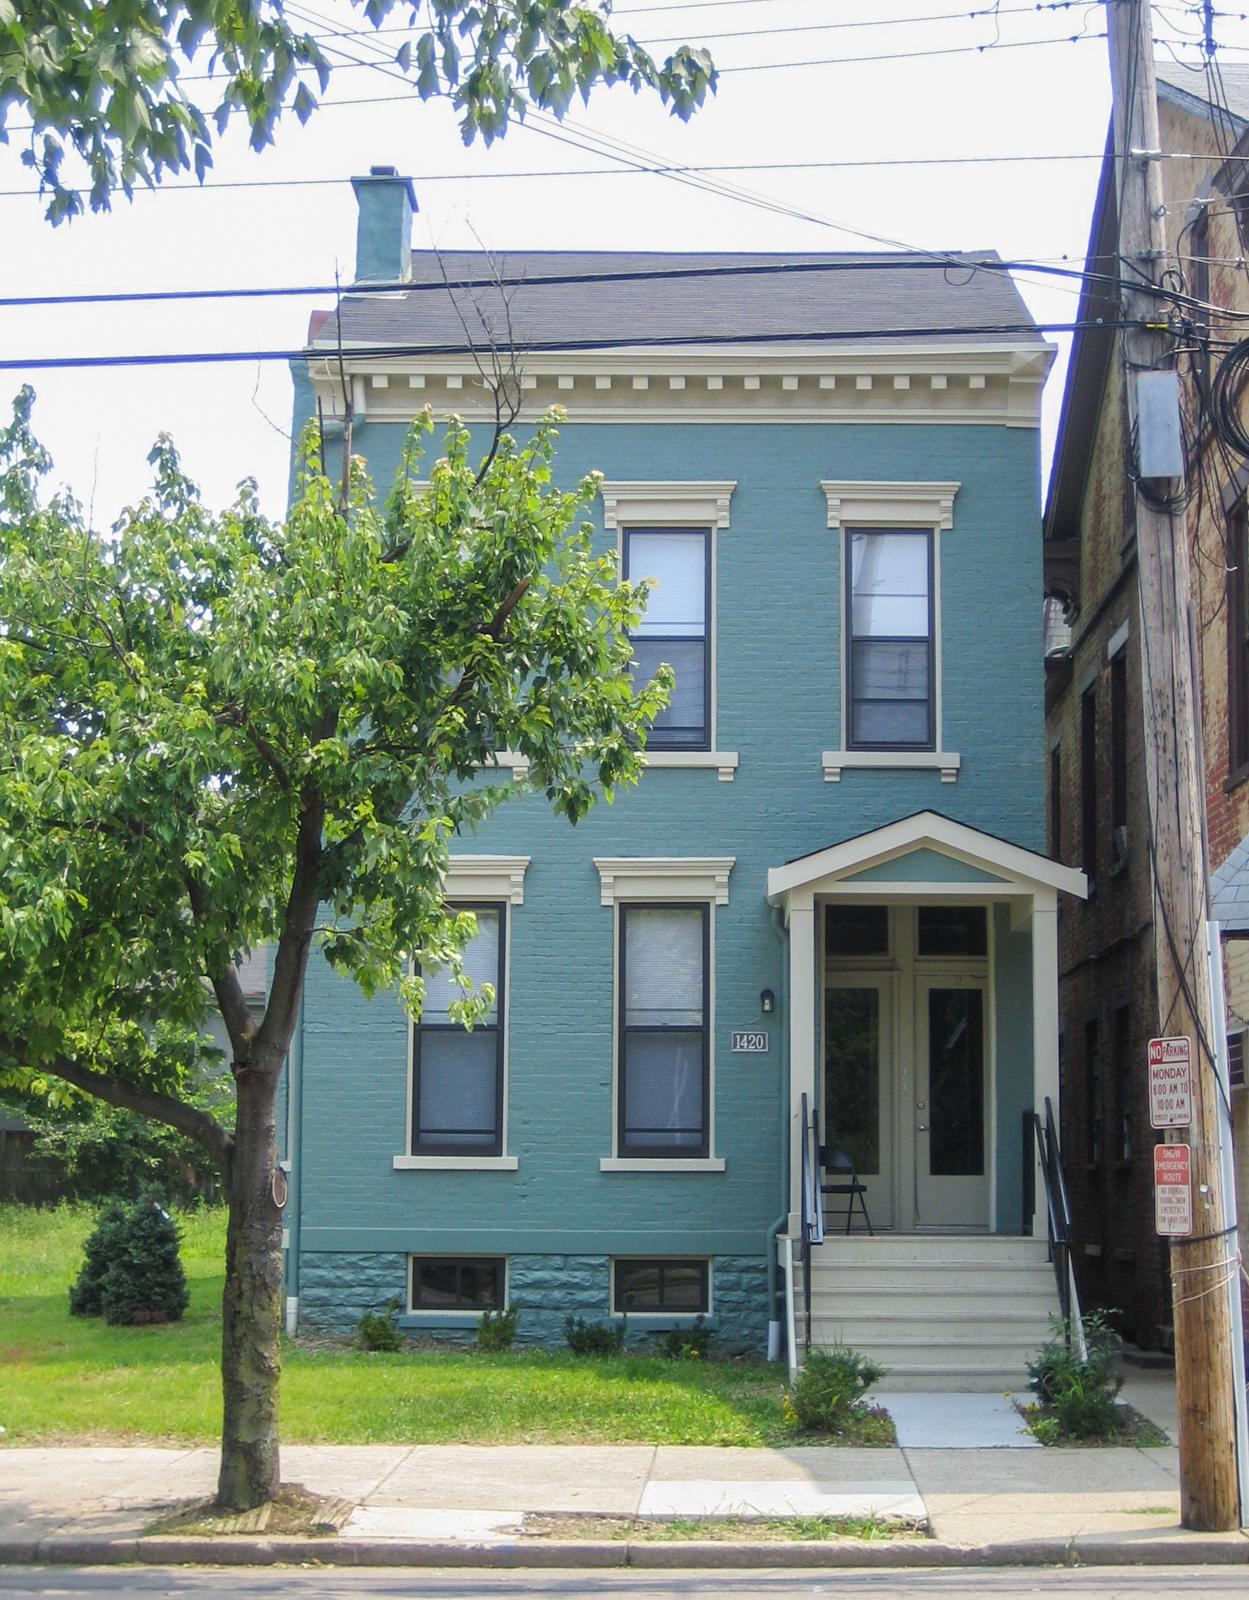 Eastside Historic Exterior 5